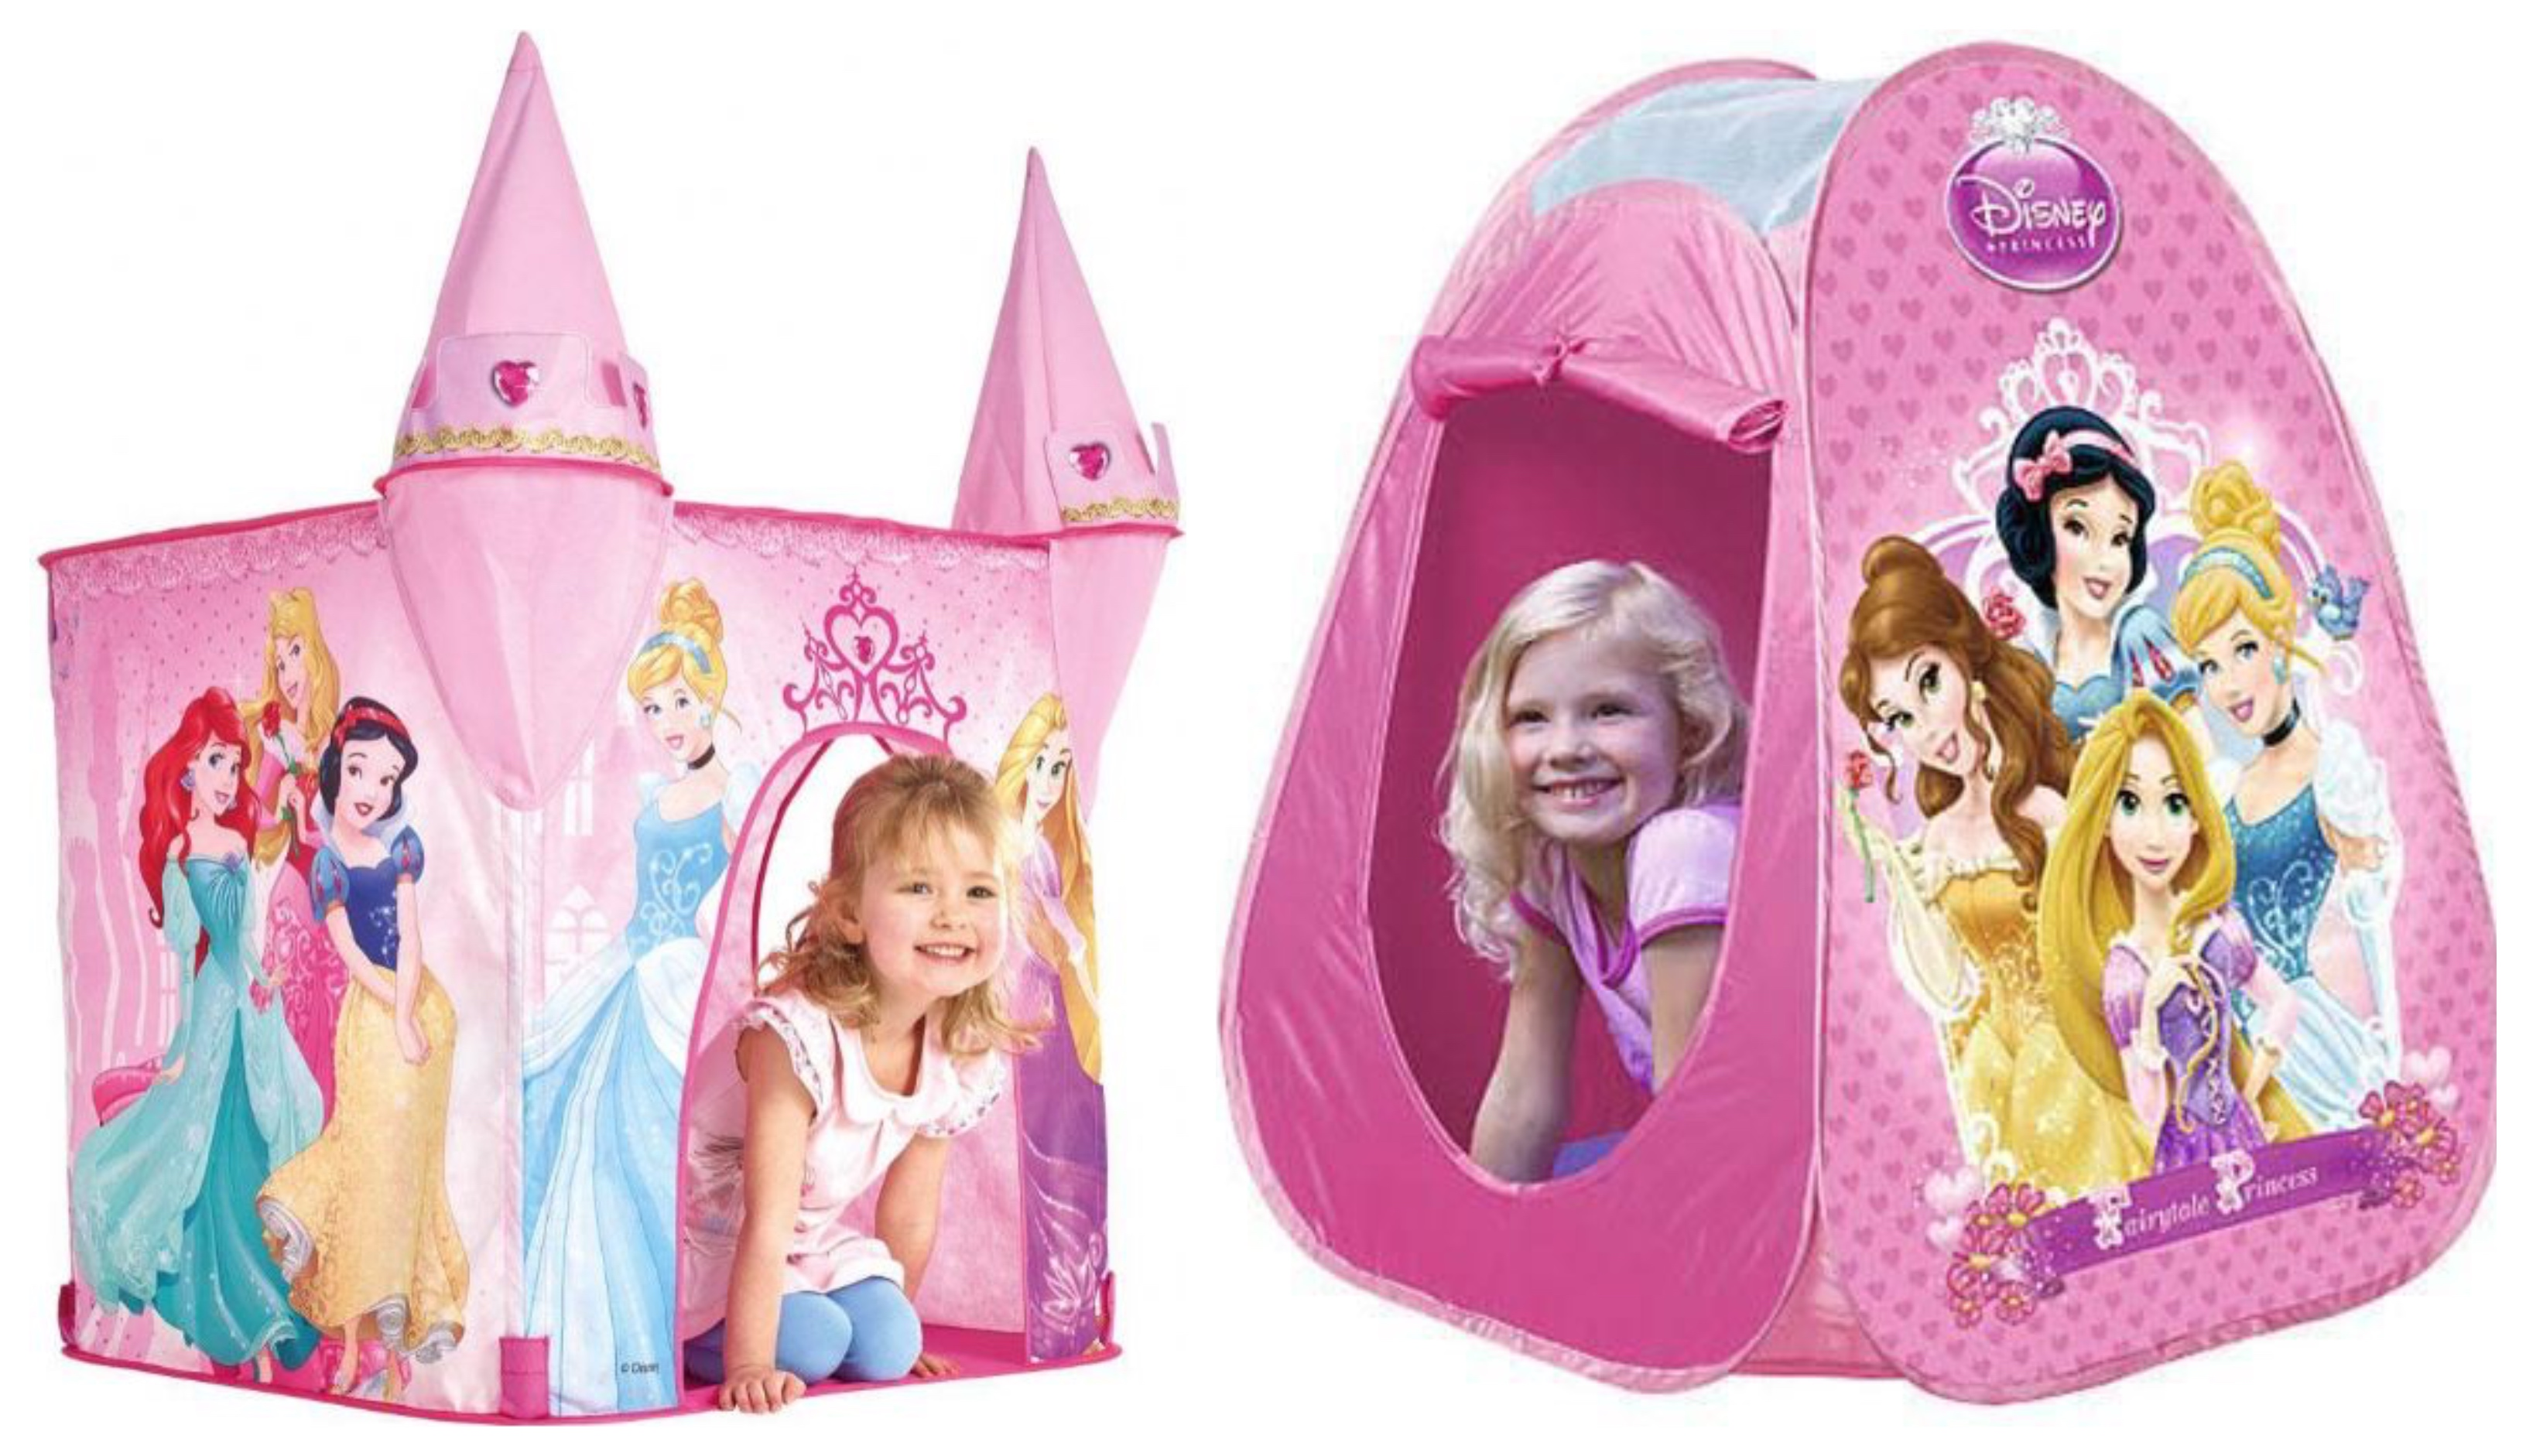 Disney prinsesse legetelt